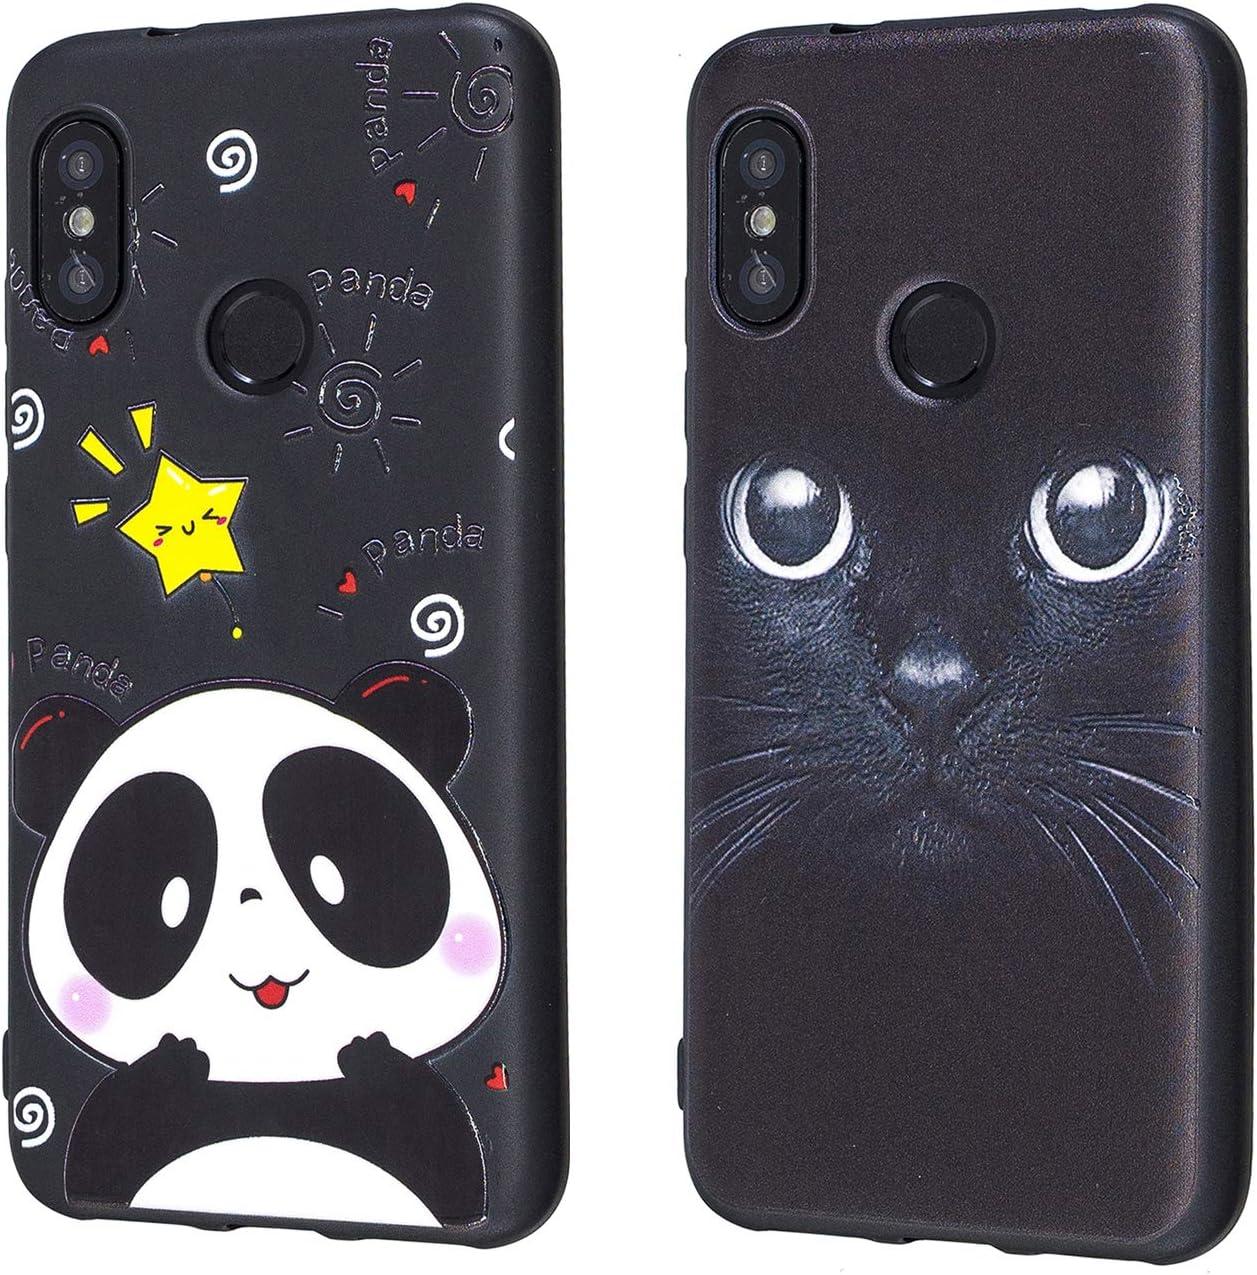 Funluna 2X Funda Xiaomi Mi A2 Lite, Slim Cubierta de Silicona Negra TPU Shock-Absorción Carcasa Gel Bumper Rubber Case Trasero Cover para Xiaomi Mi A2 Lite, Panda&Gato Negro